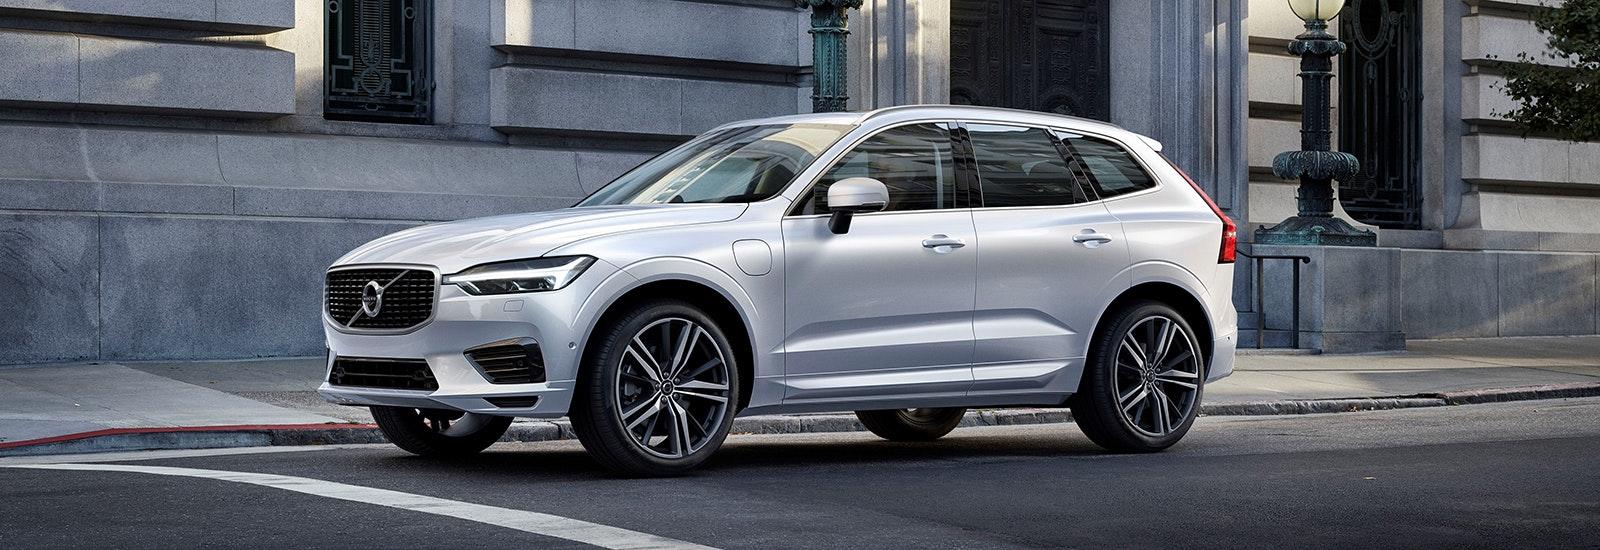 Volvo xc60 dimensions